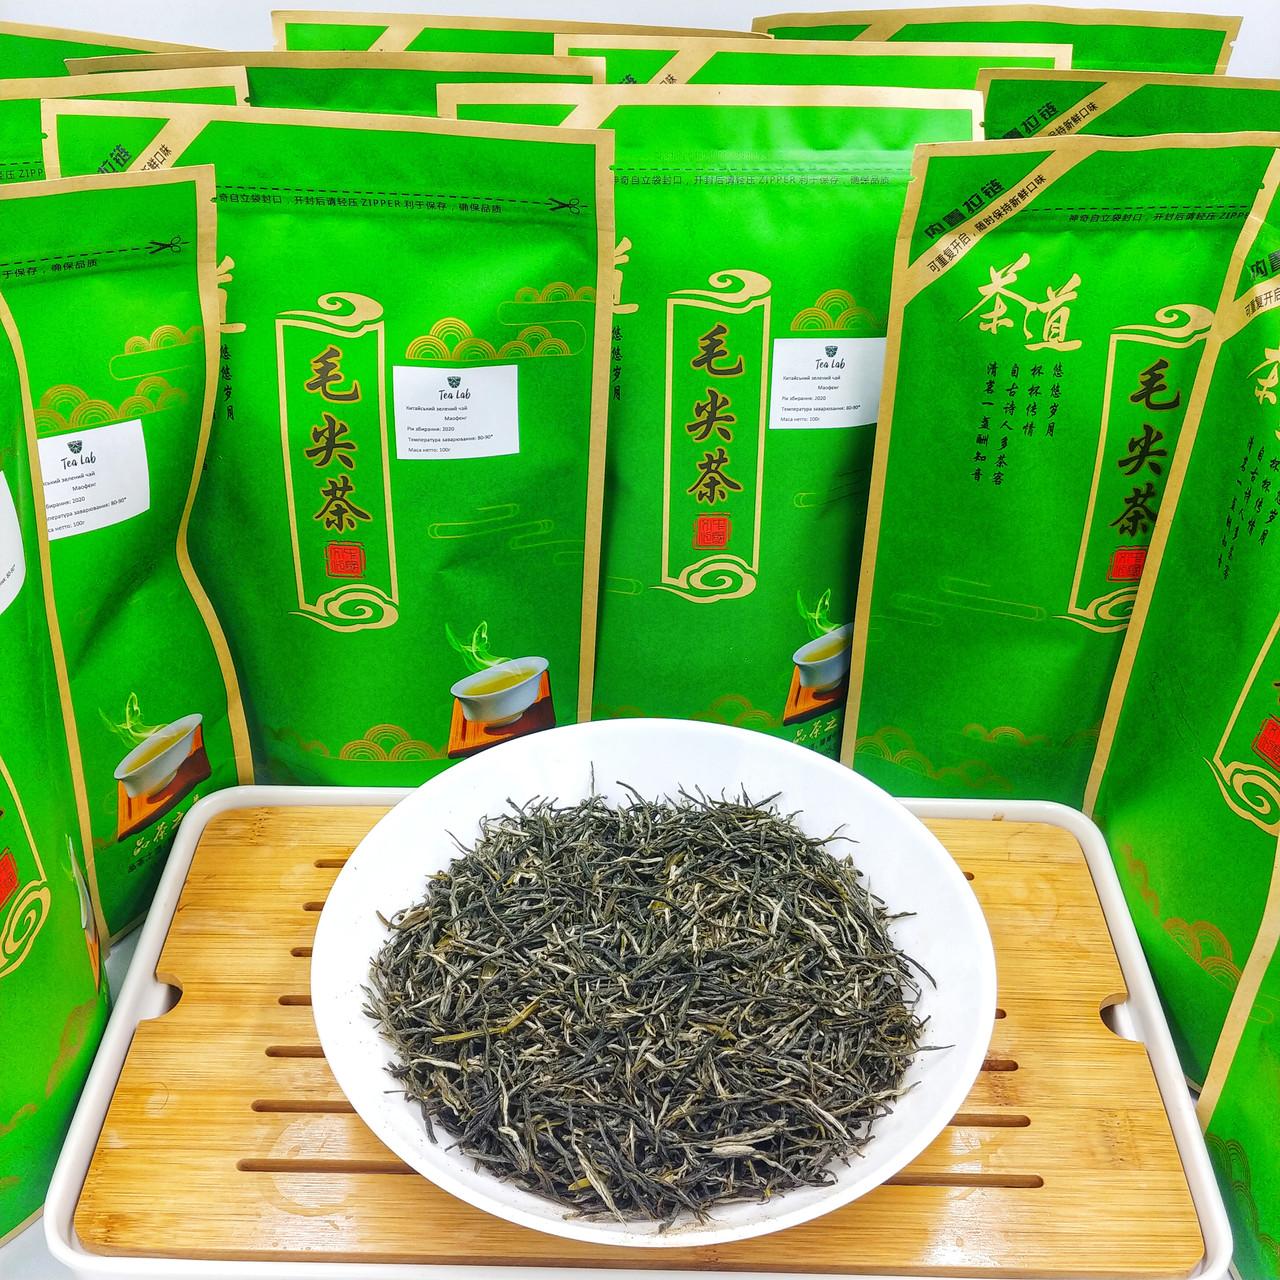 Зеленый чай, Мао Фен за 100 гр.